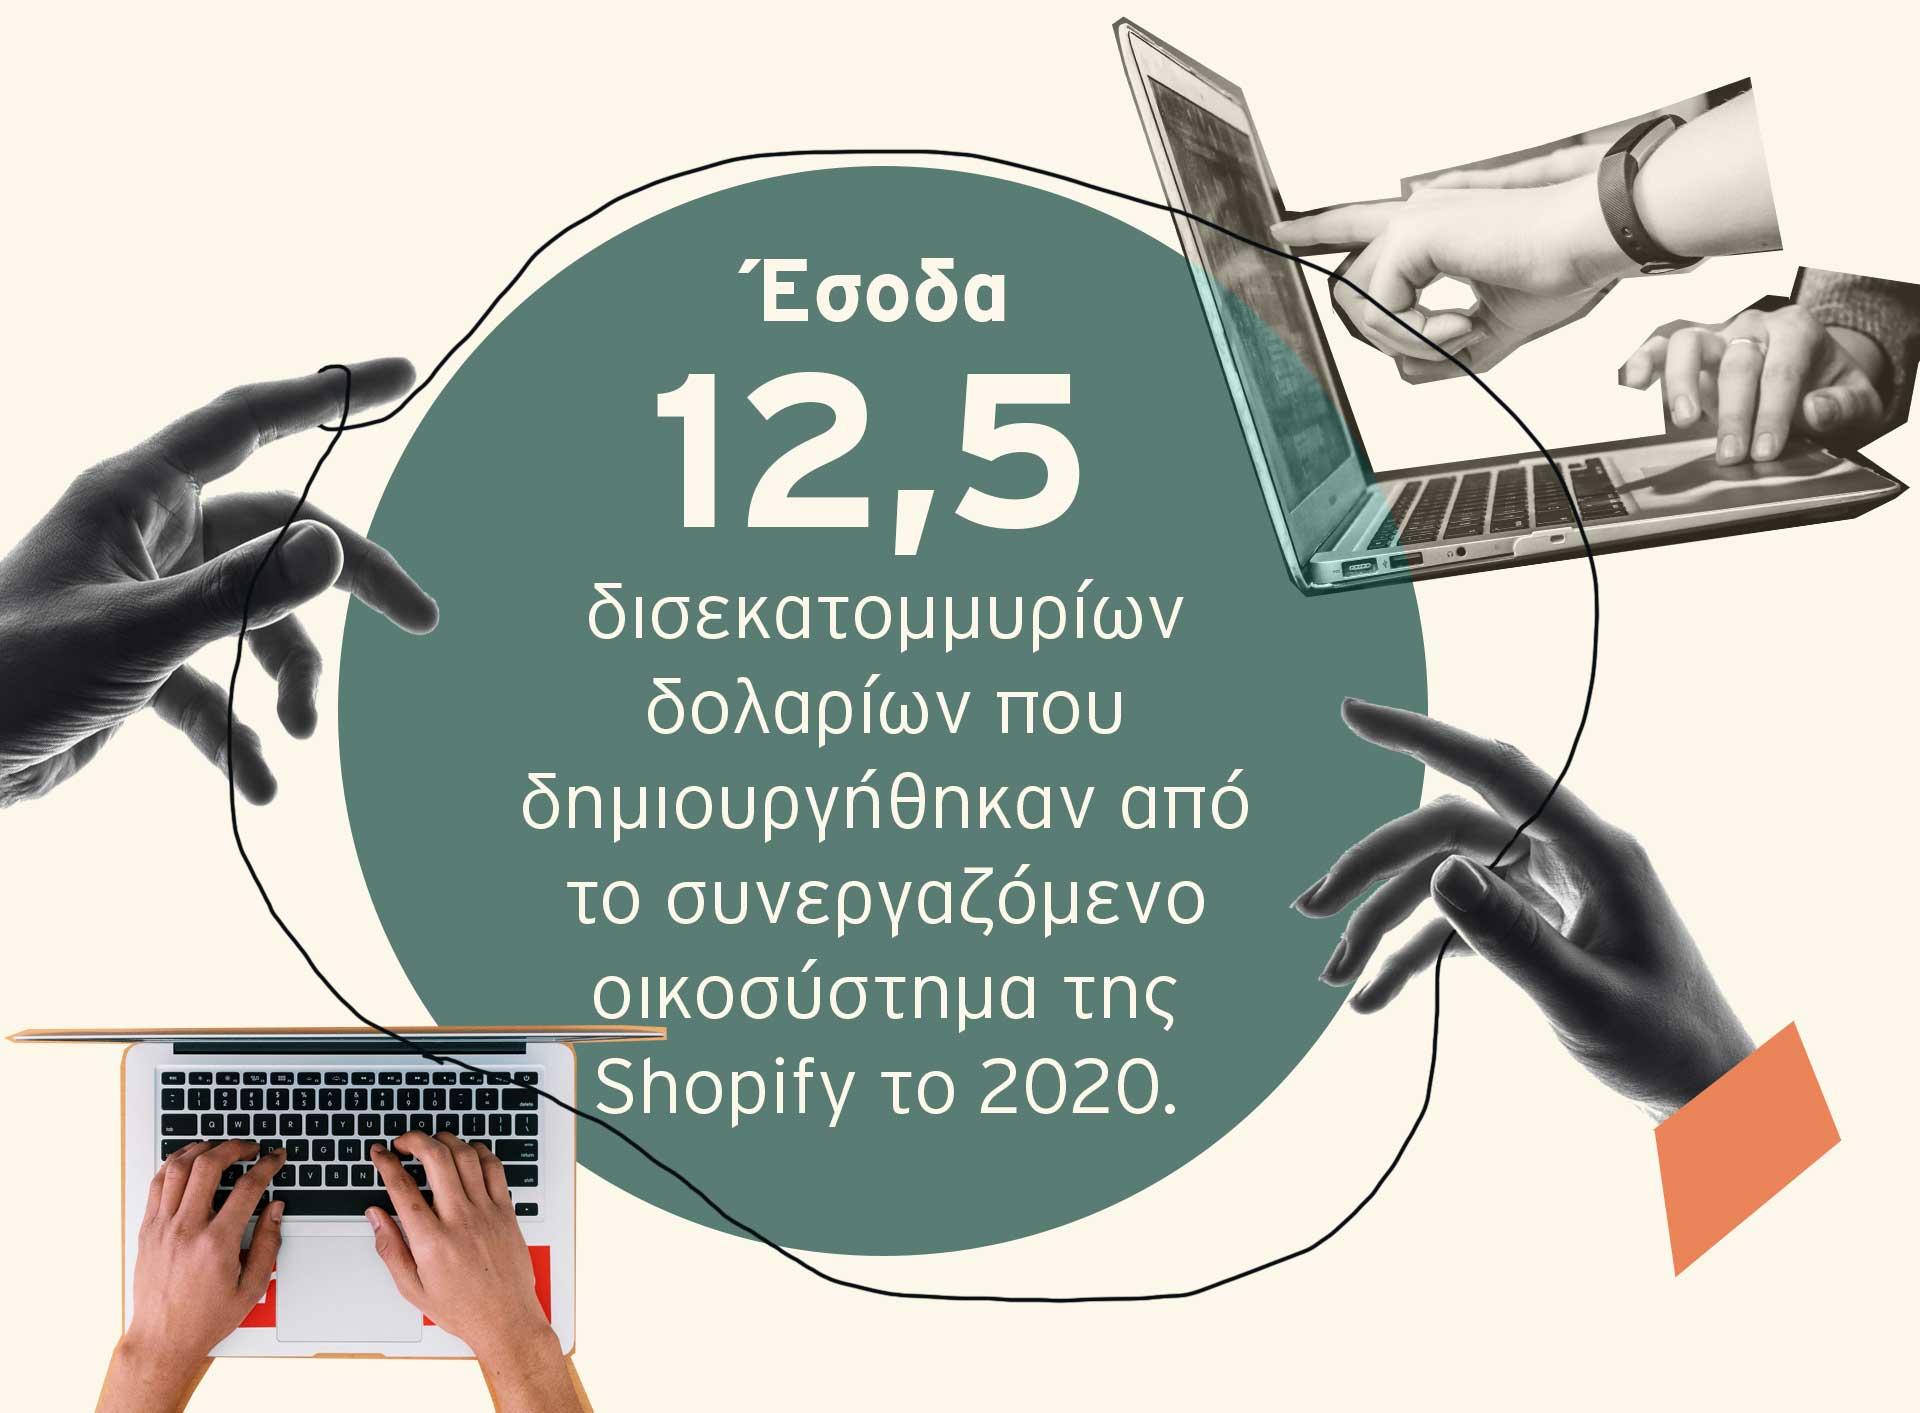 The-Shopify-Effect-esoda_Think-Plus_3